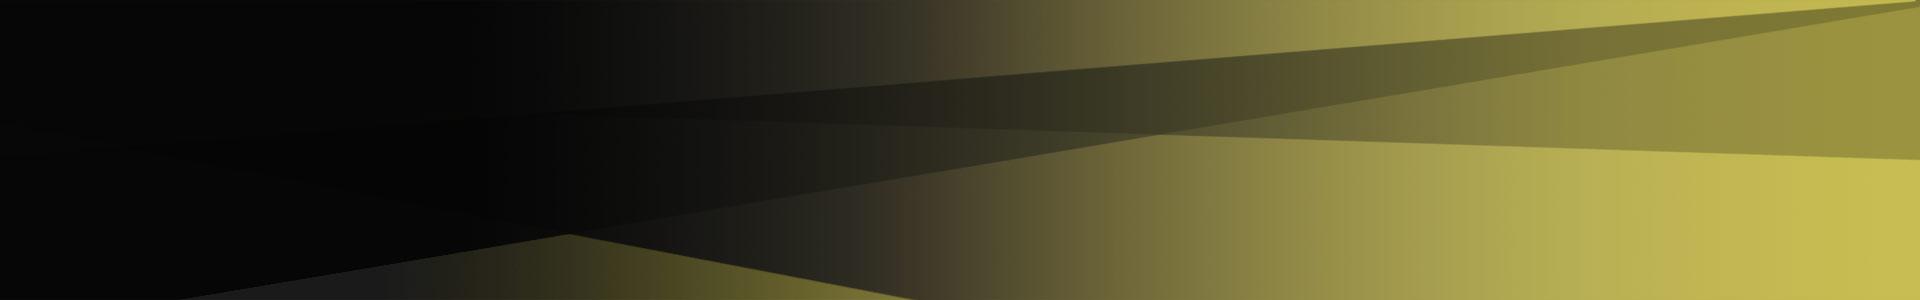 slider-background-gold